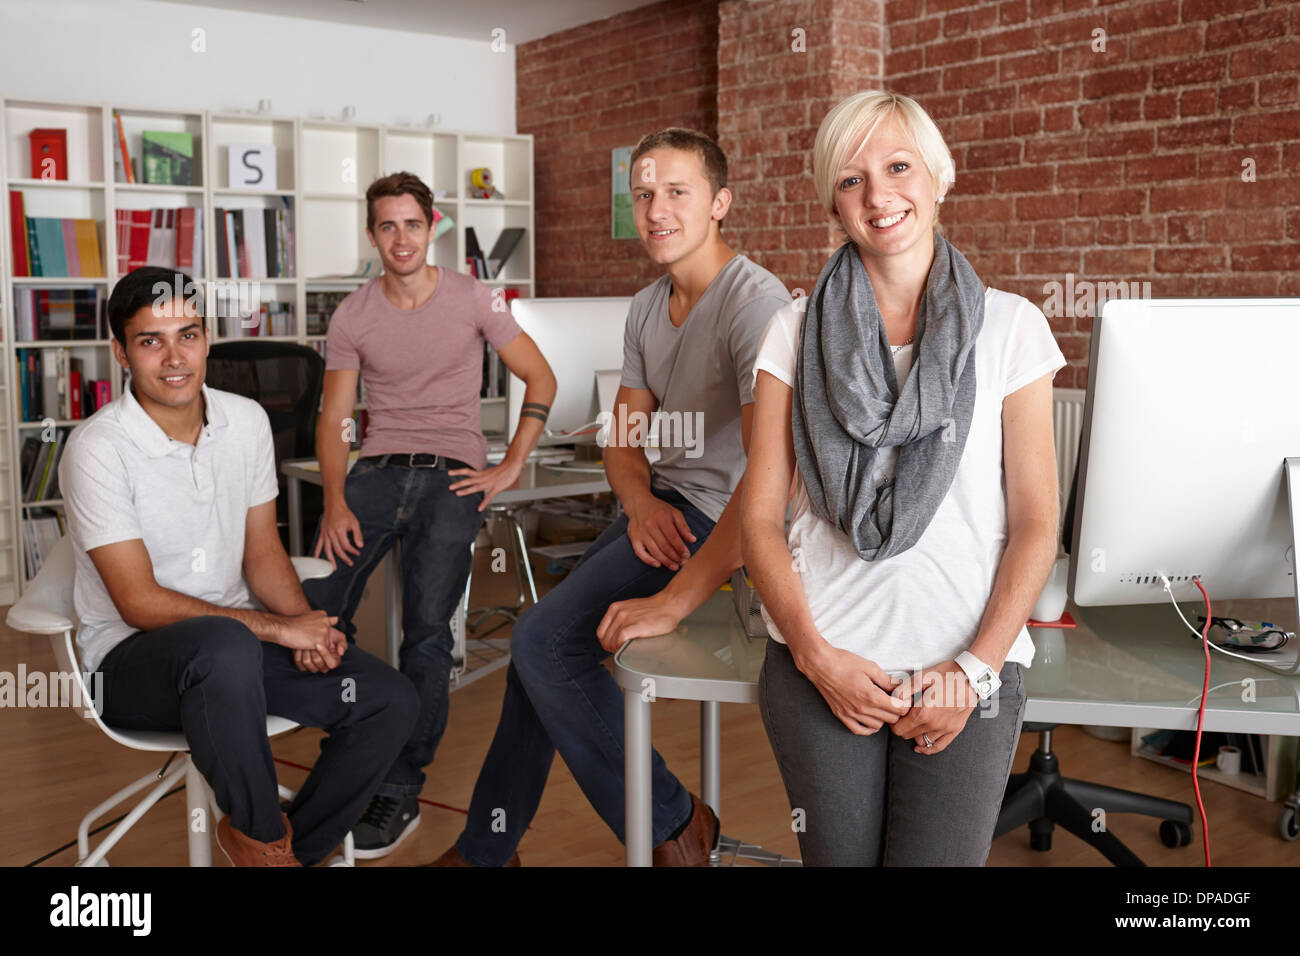 Porträt von Kolleginnen und Kollegen im Kreativbüro Stockbild